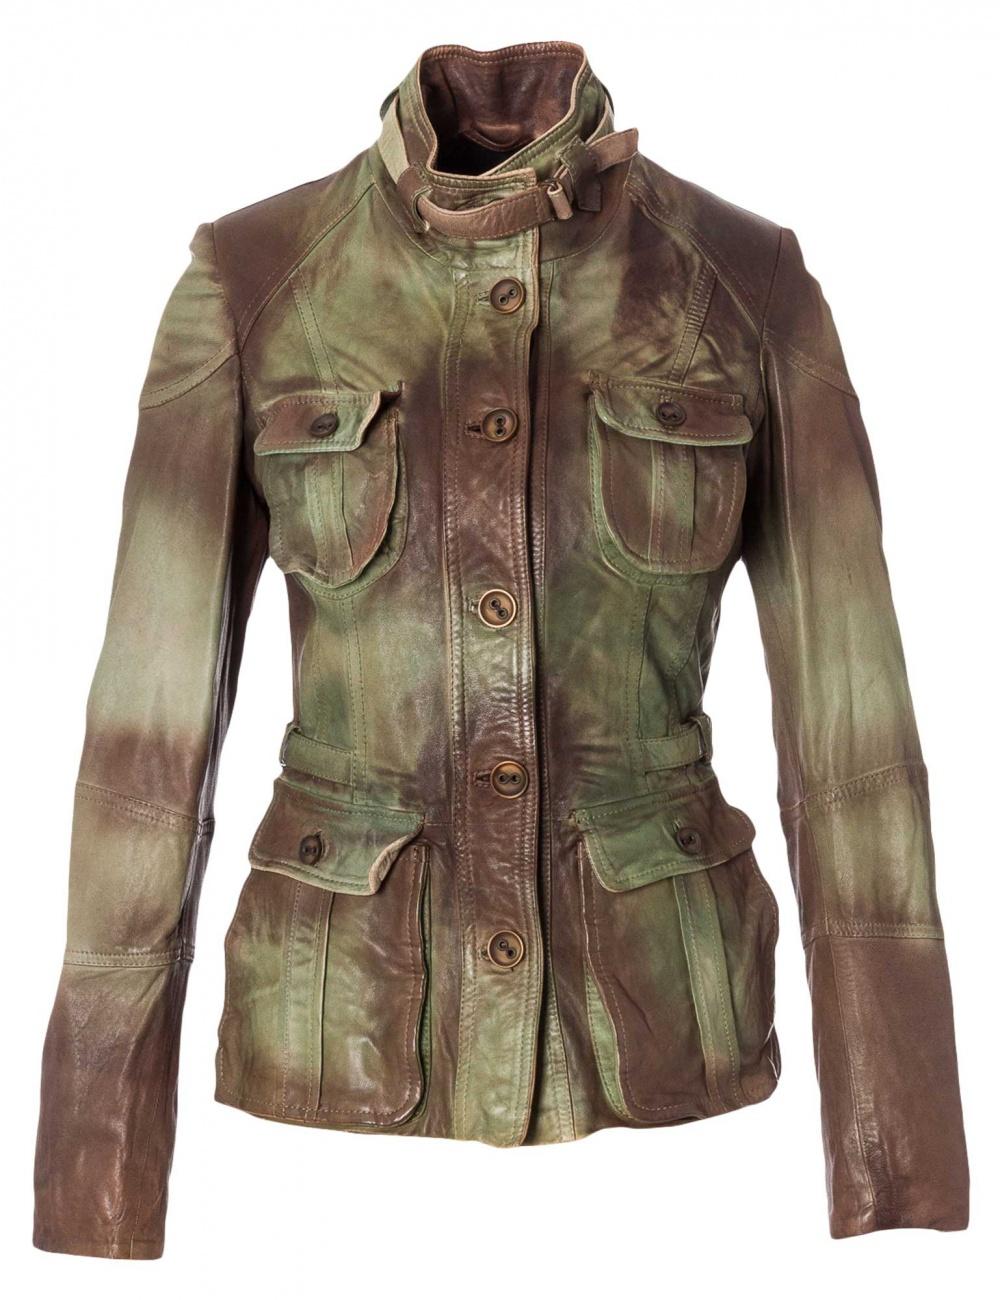 Кожаная куртка ELEVEN ELFS by MANUEL LUCIANO размер S